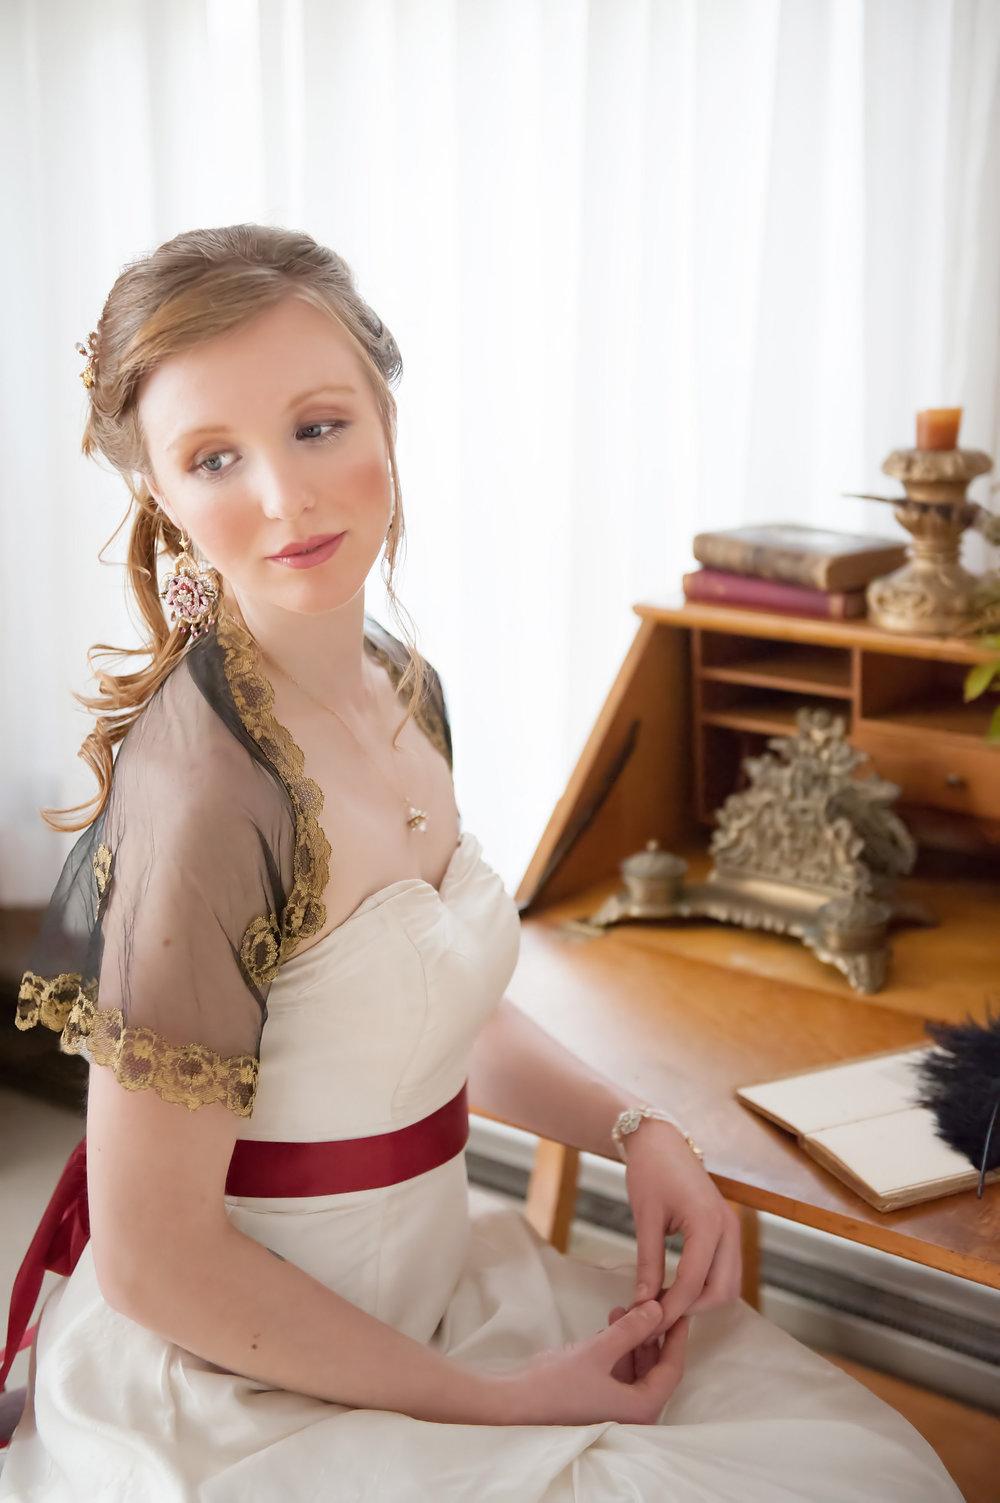 Tudor Rose  Earrings,  Elspeth  Necklace, and  Gloriana  Bracelet